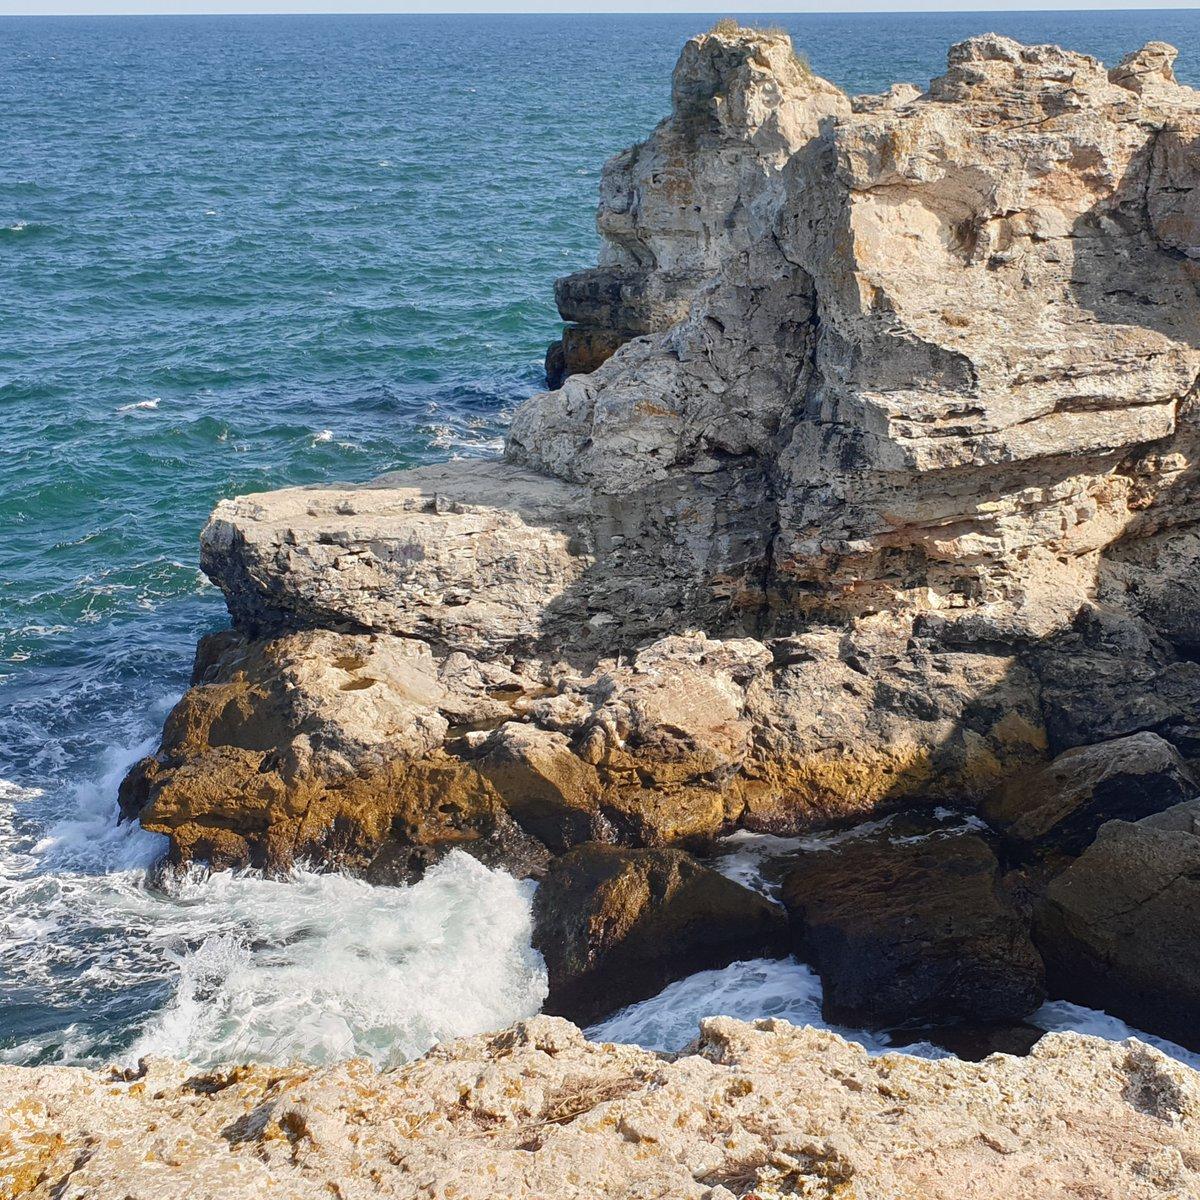 Доброе утро мир. Я тебя люблю. #NaturePhotography #SEA #blacksea #beauty #seaside https://t.co/gD9EAjdMZy